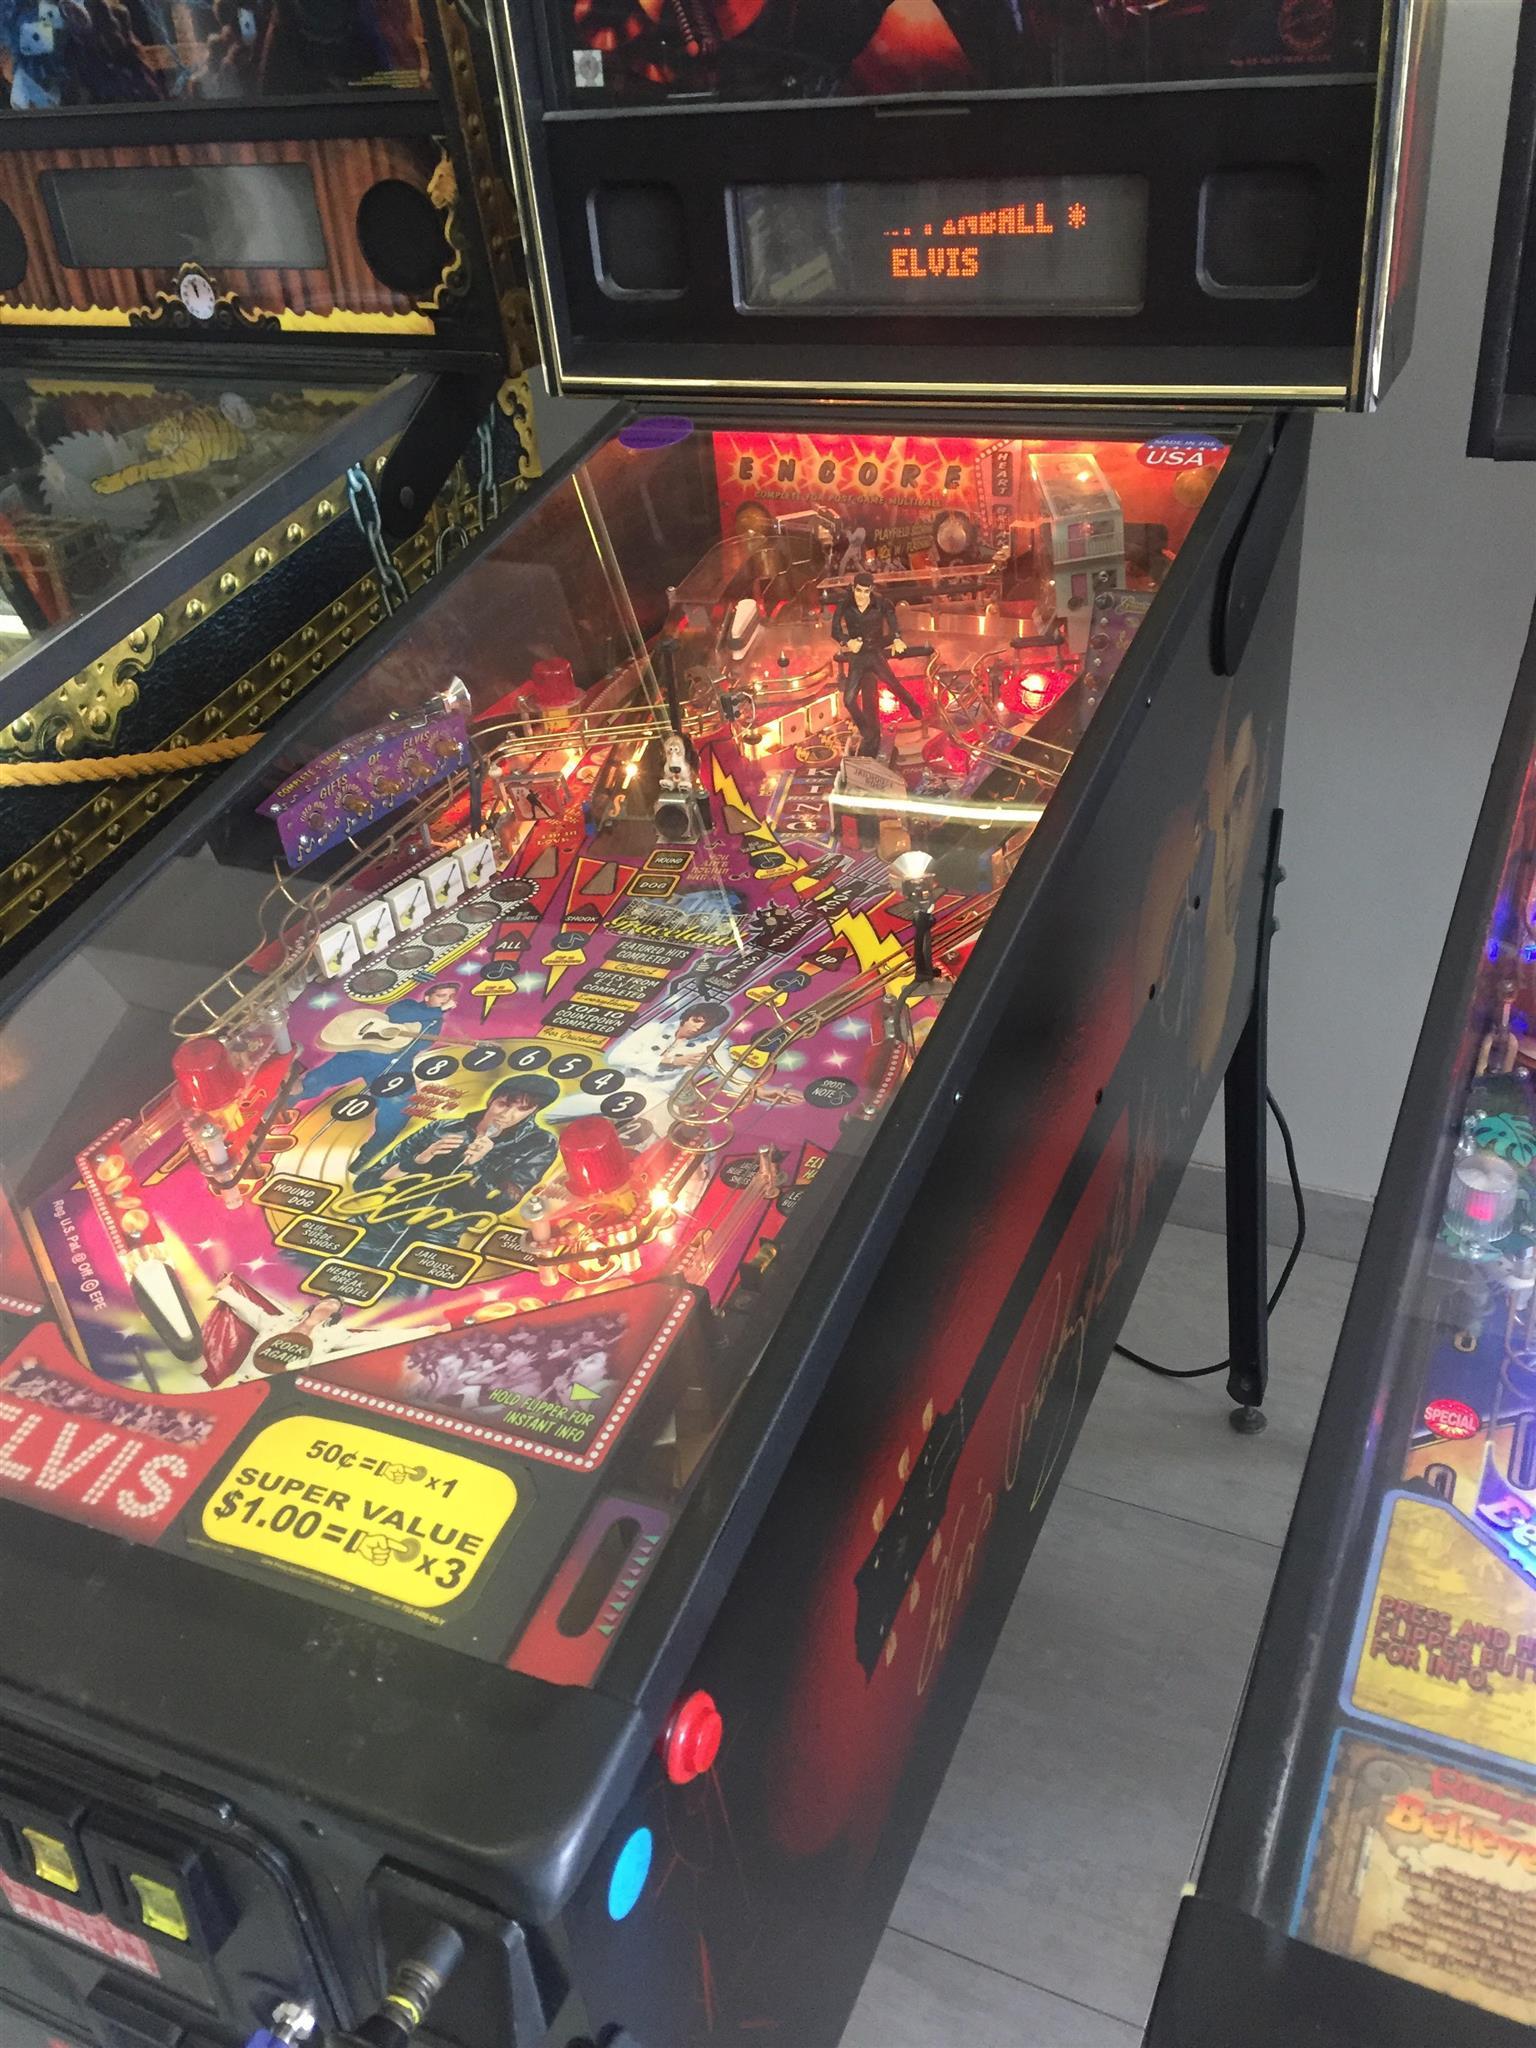 Elvis Pinball Machine for Sale, a pinball machine by Stern